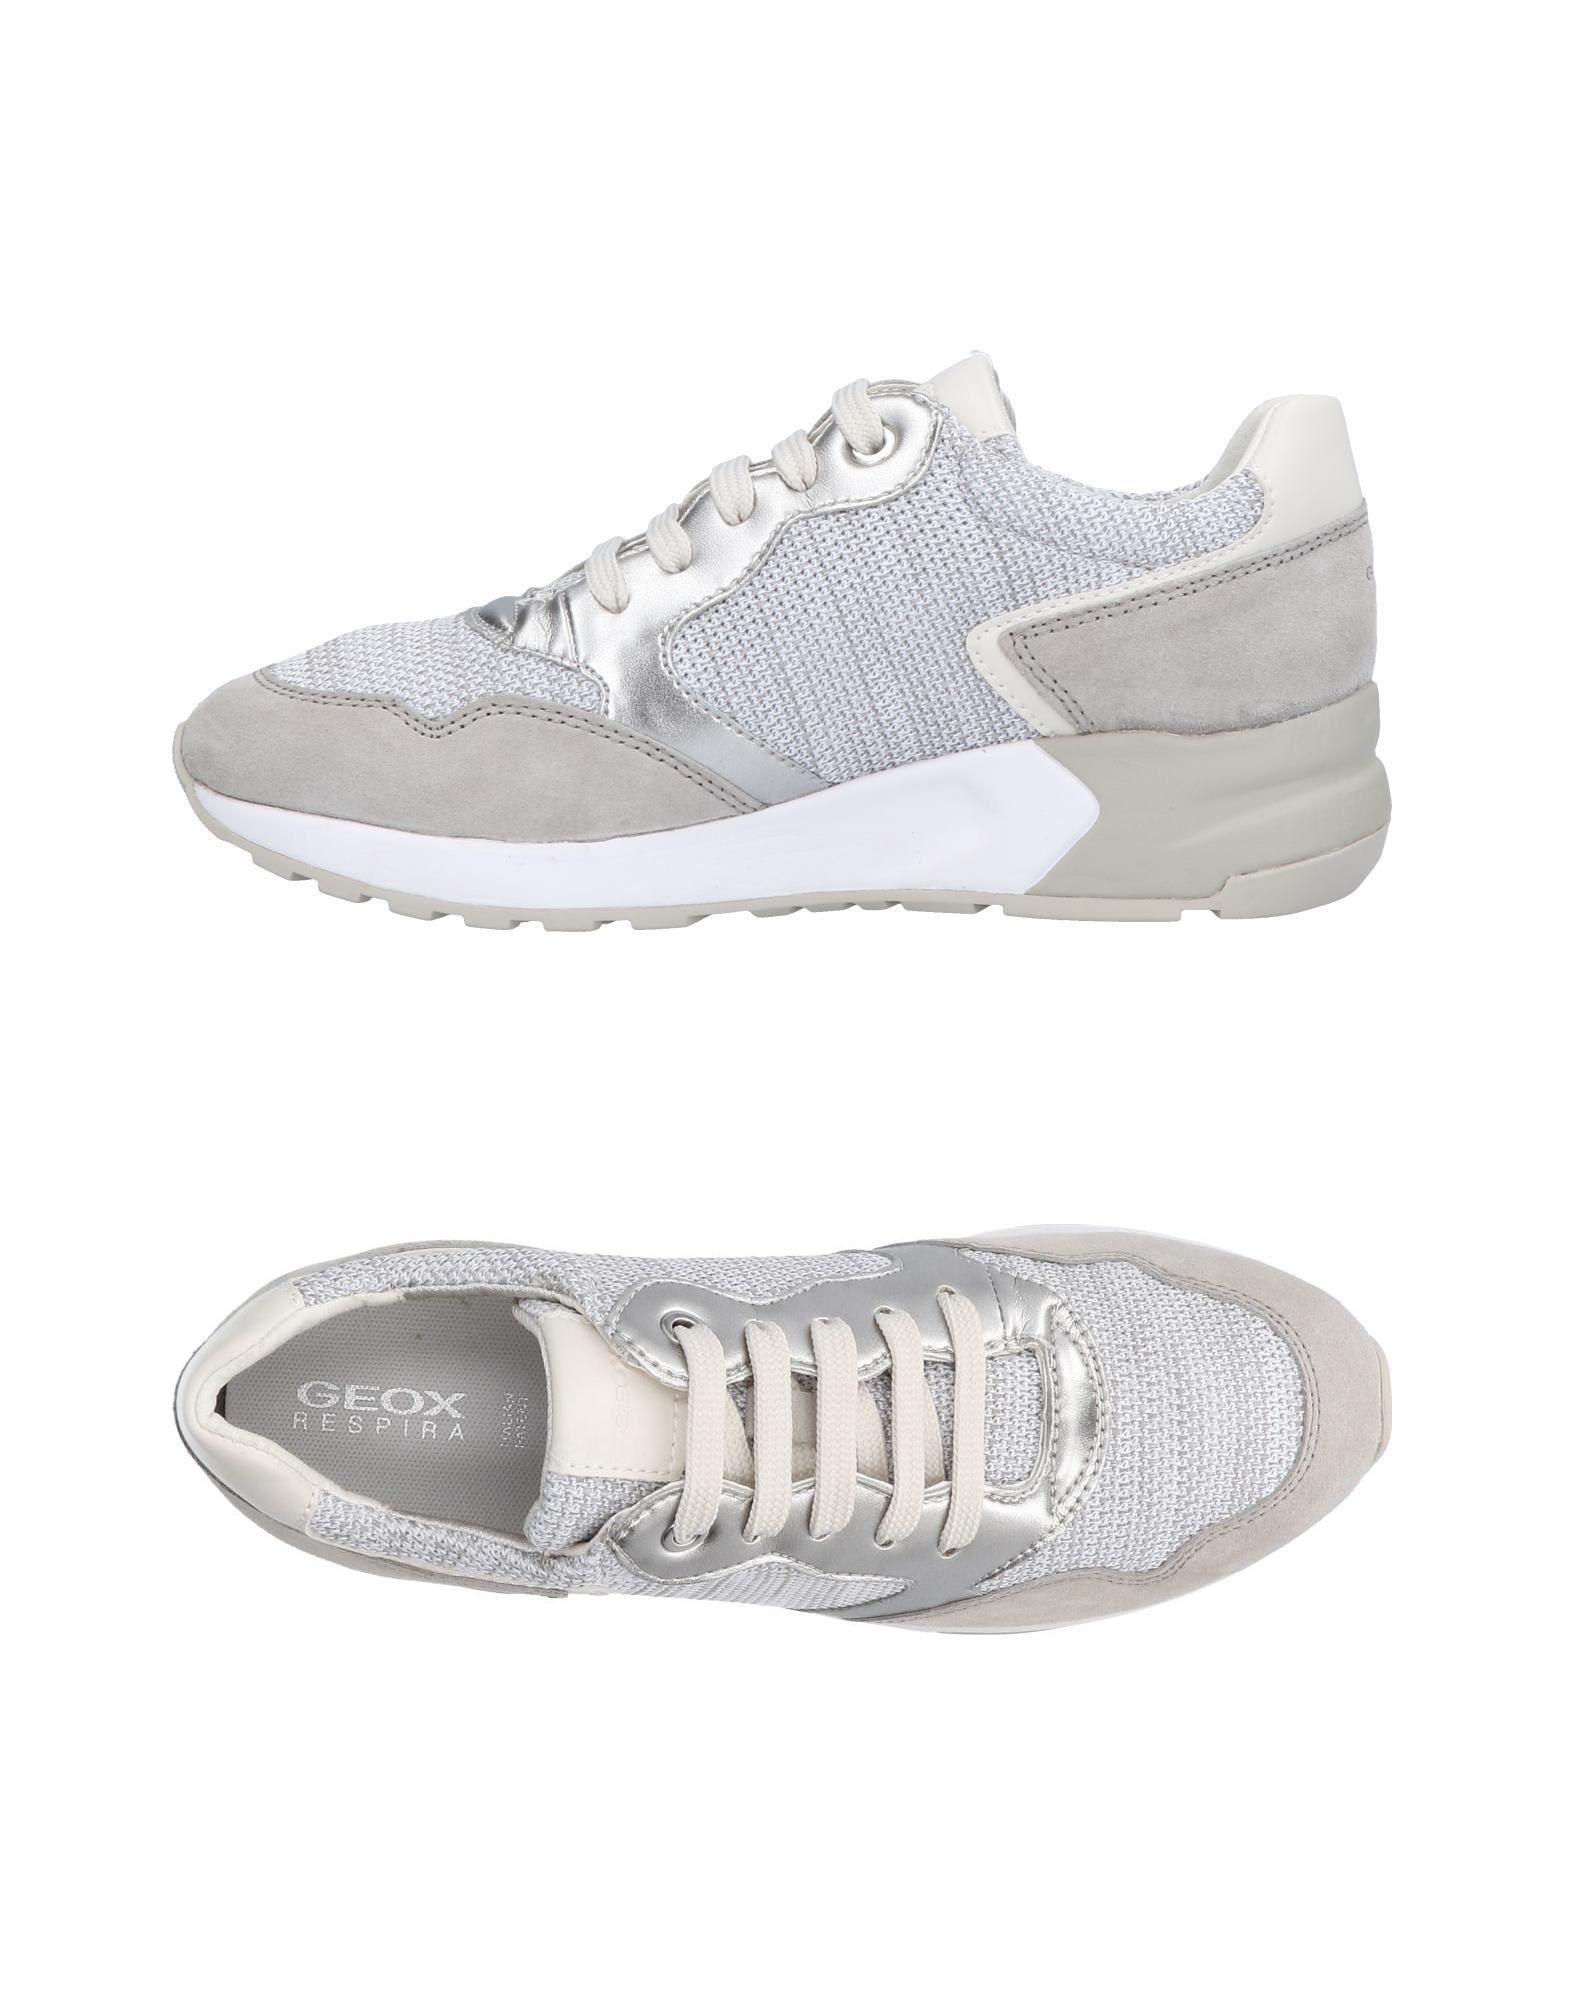 Geox Sneakers Damen  11453773IH Gute Qualität beliebte Schuhe